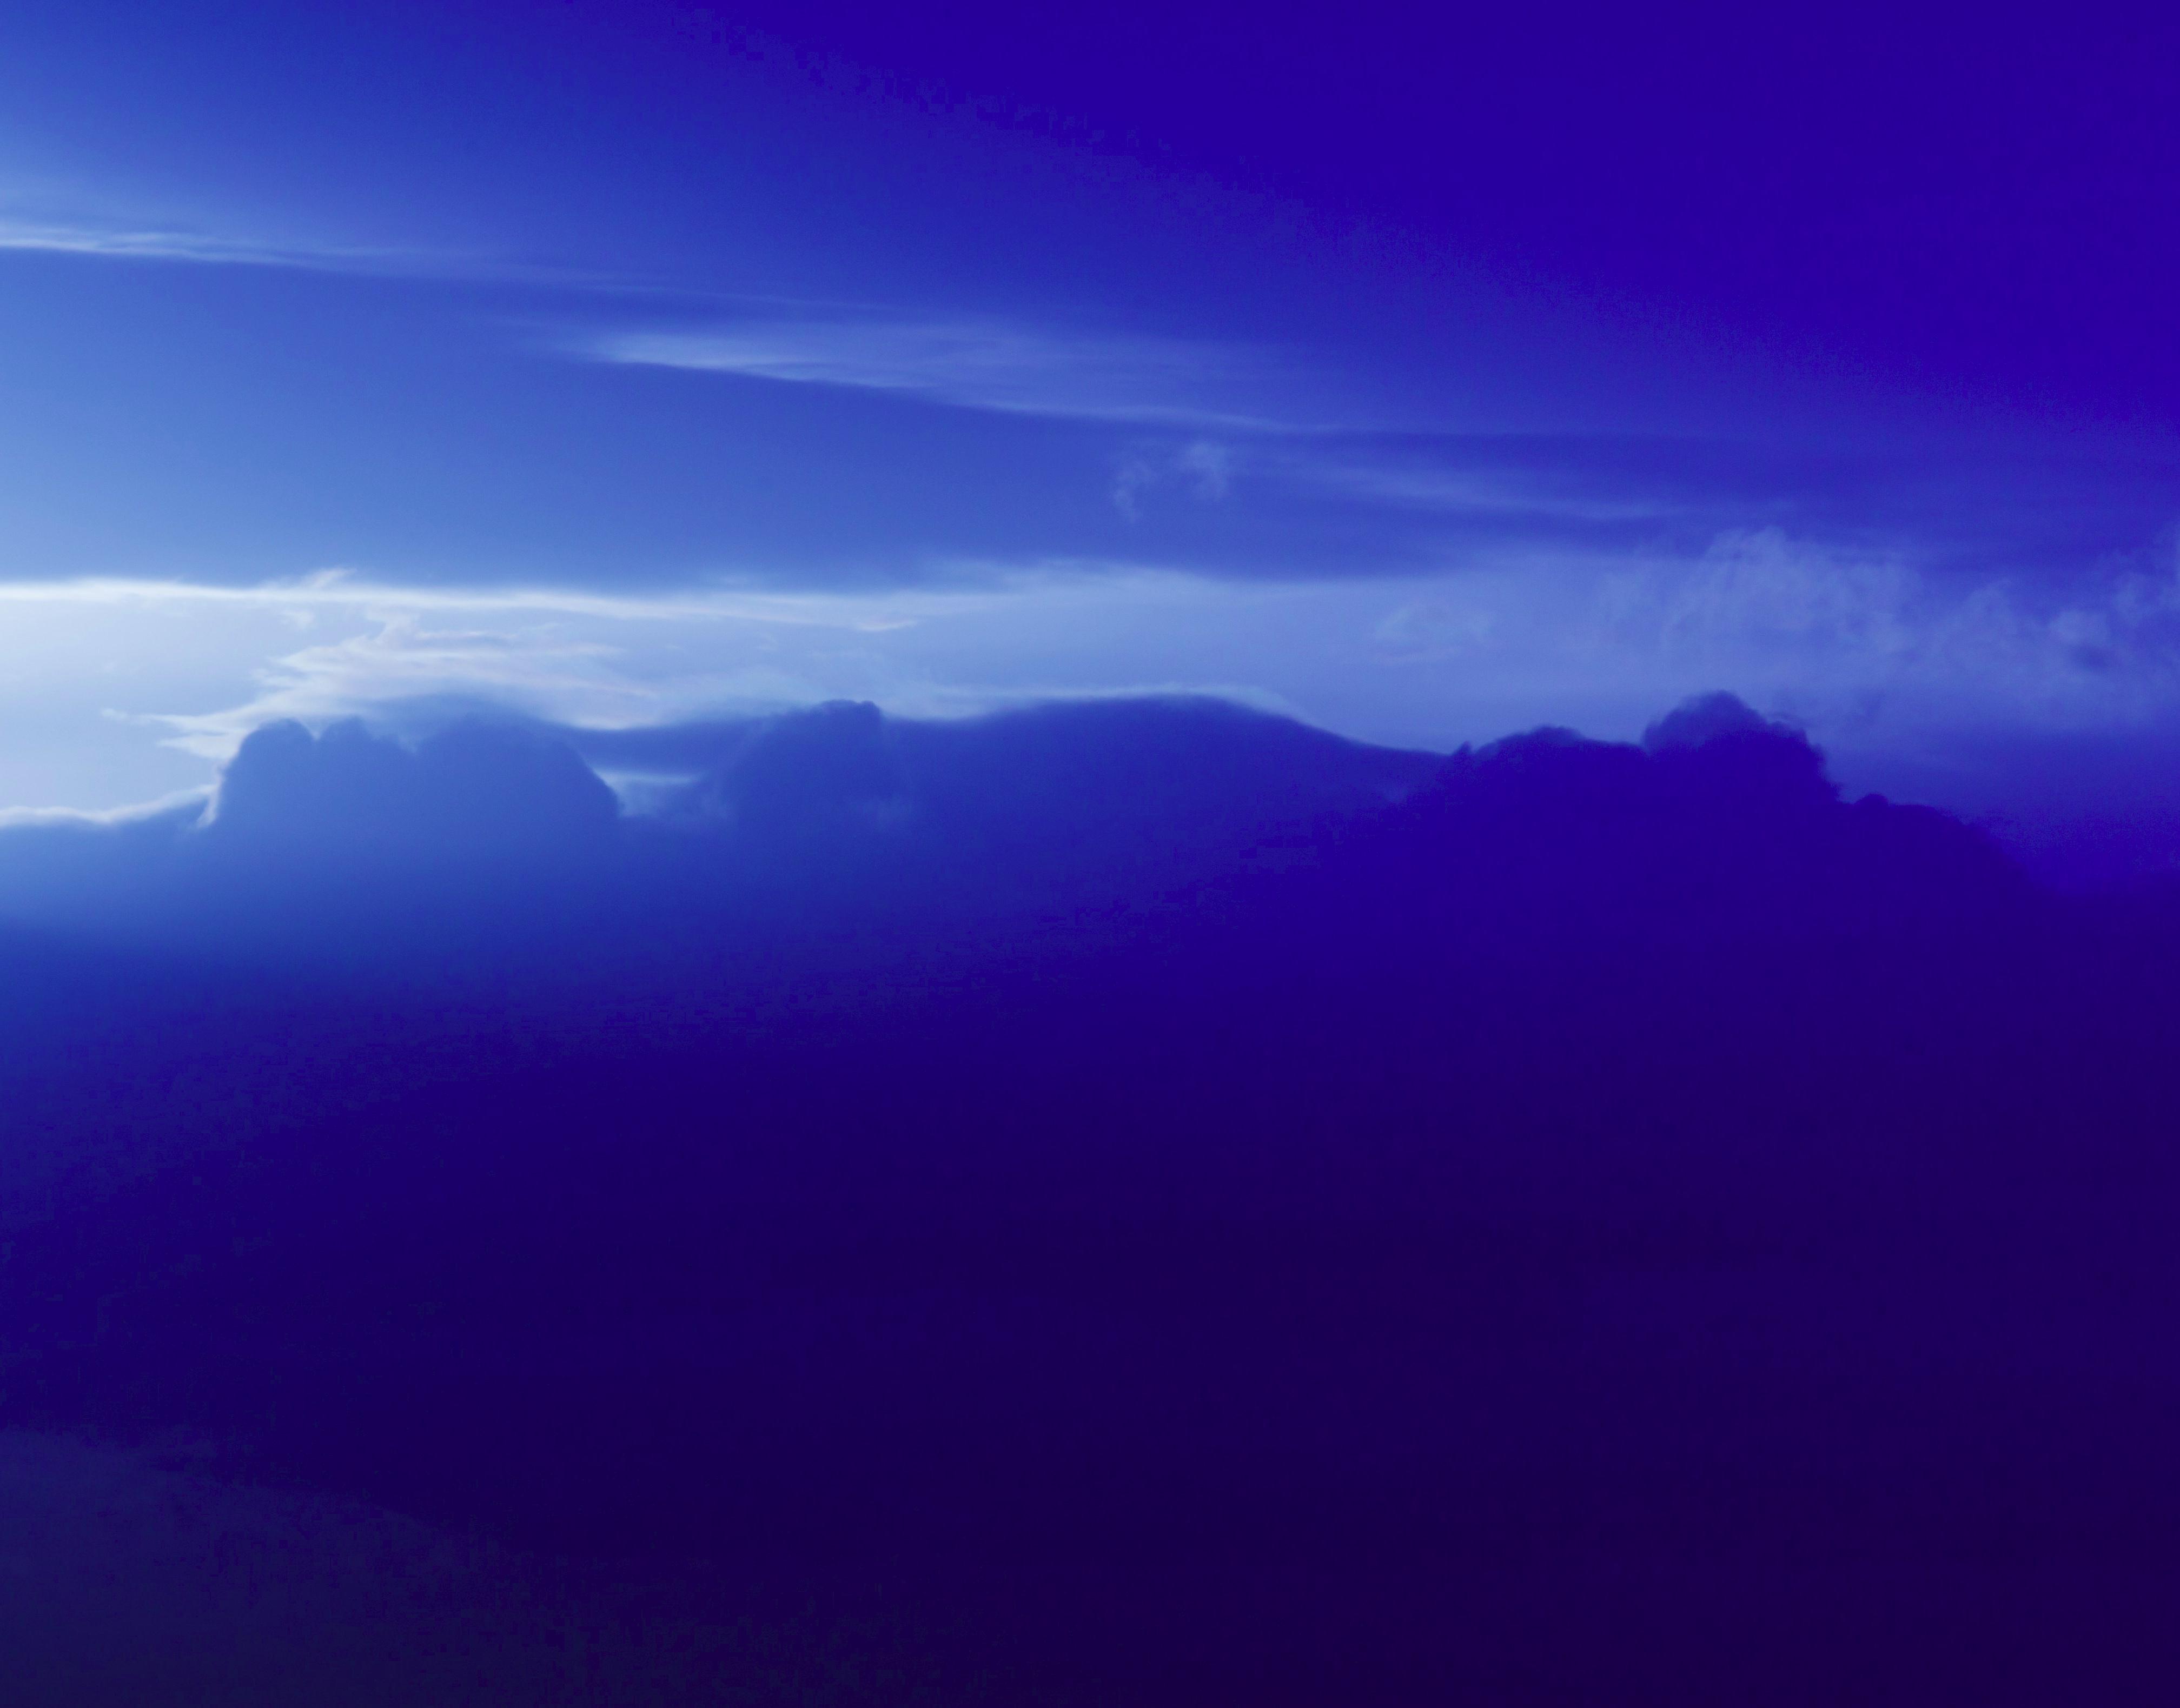 dark blue sky with - photo #25